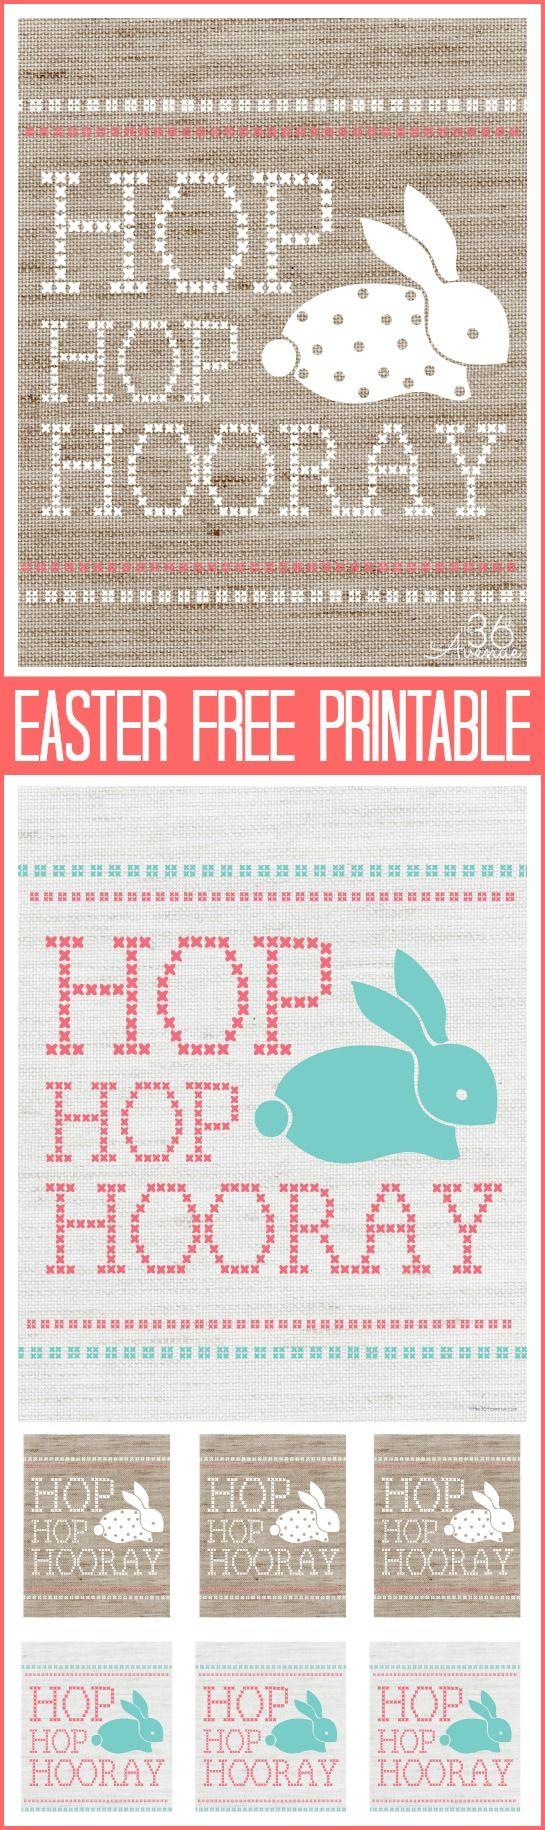 Adorable FREE Easter Printables @Matty Chuah 36th Avenue .com #easter #printable